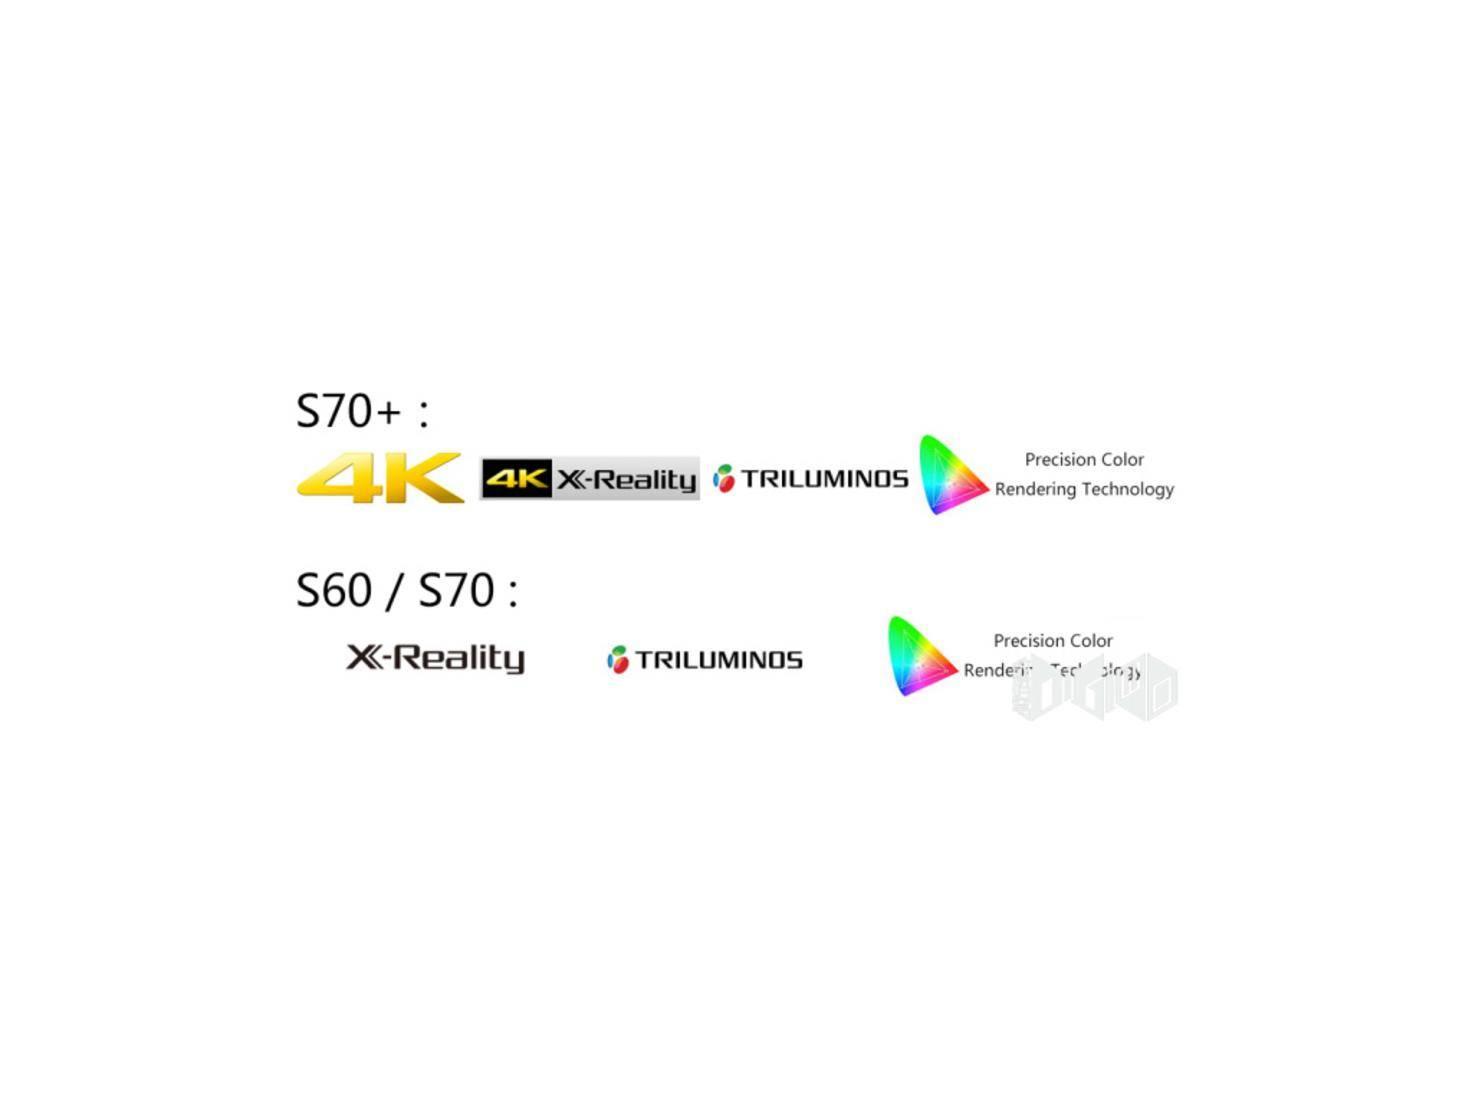 Xperia-4K-Reality